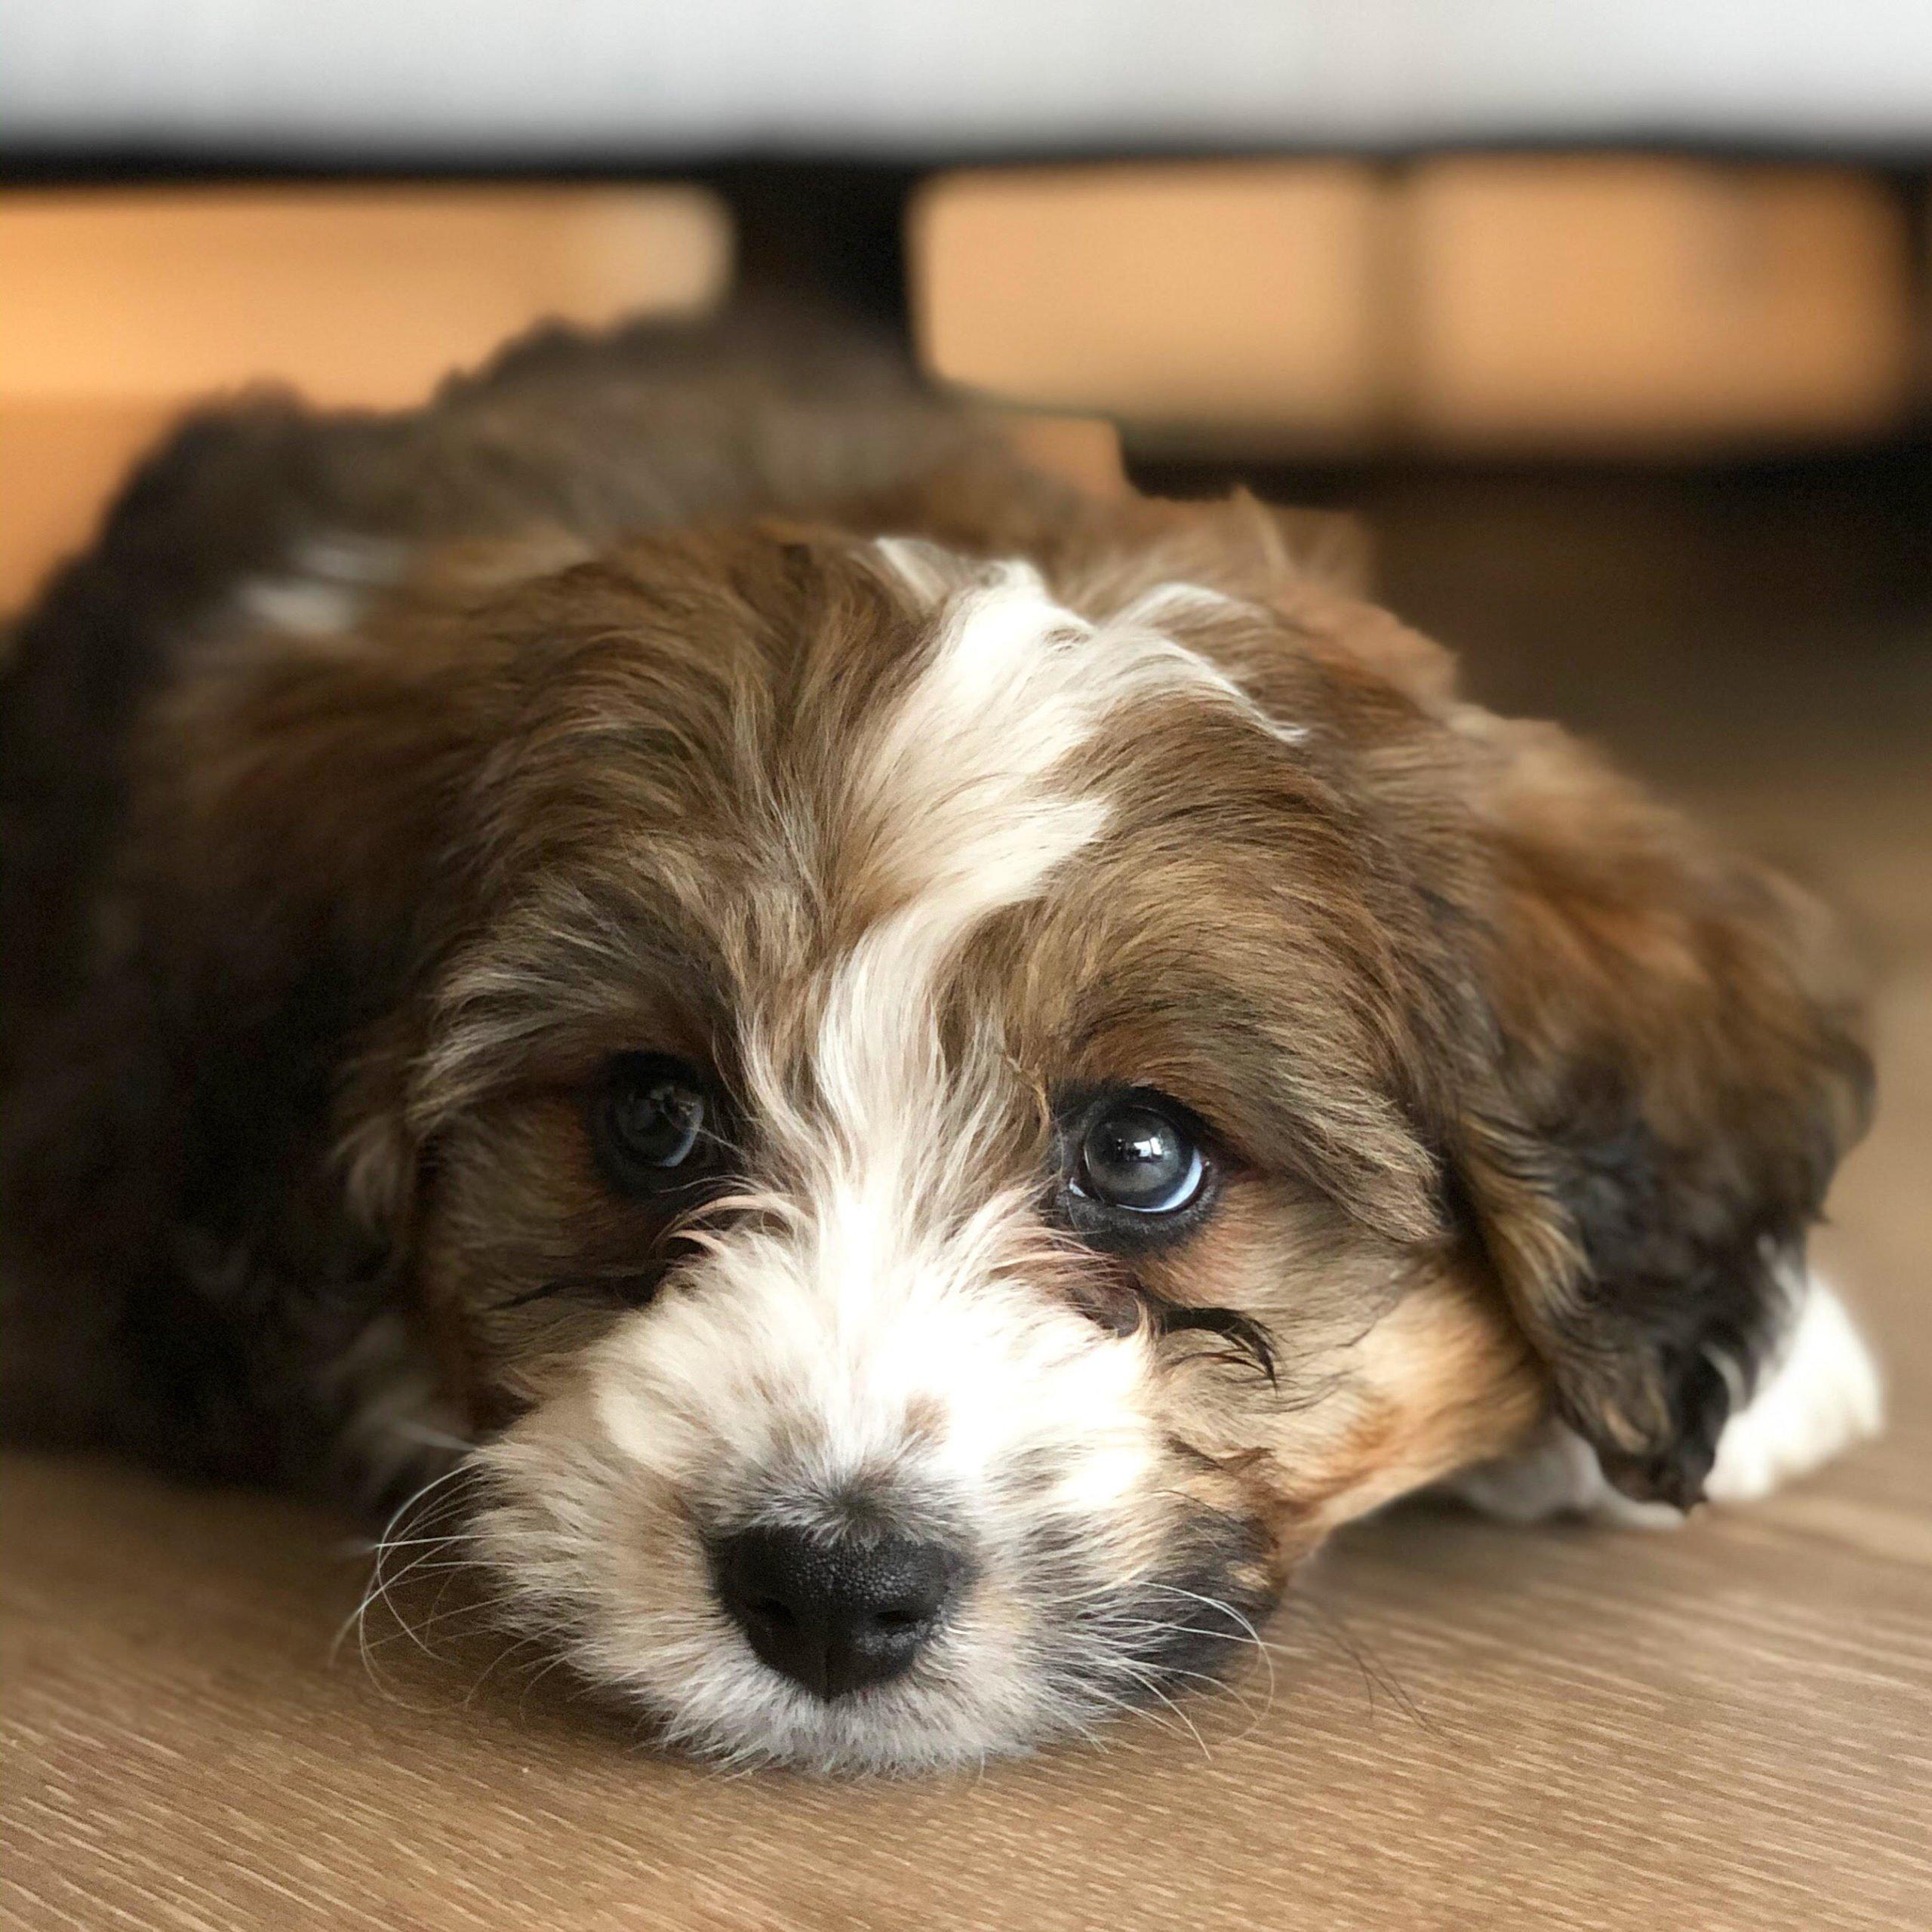 14 Adorable Quarantine Pets (With Photos!)